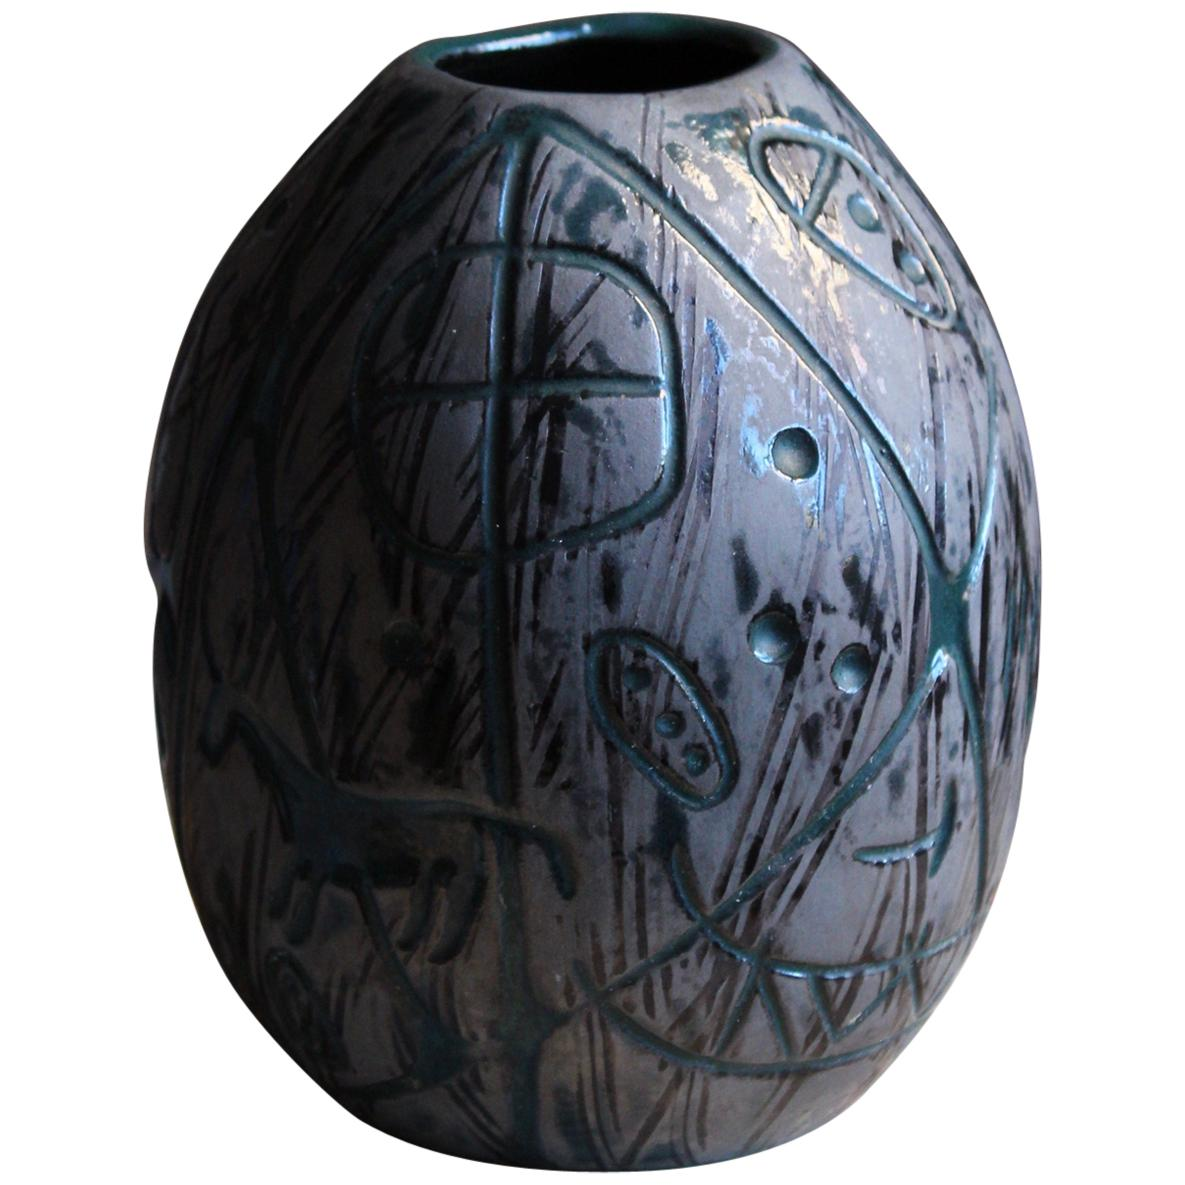 "Mari Simmulson, ""Hedenhös"" Vase, Glazed Stoneware, Upsala Ekeby, Sweden, 1957"